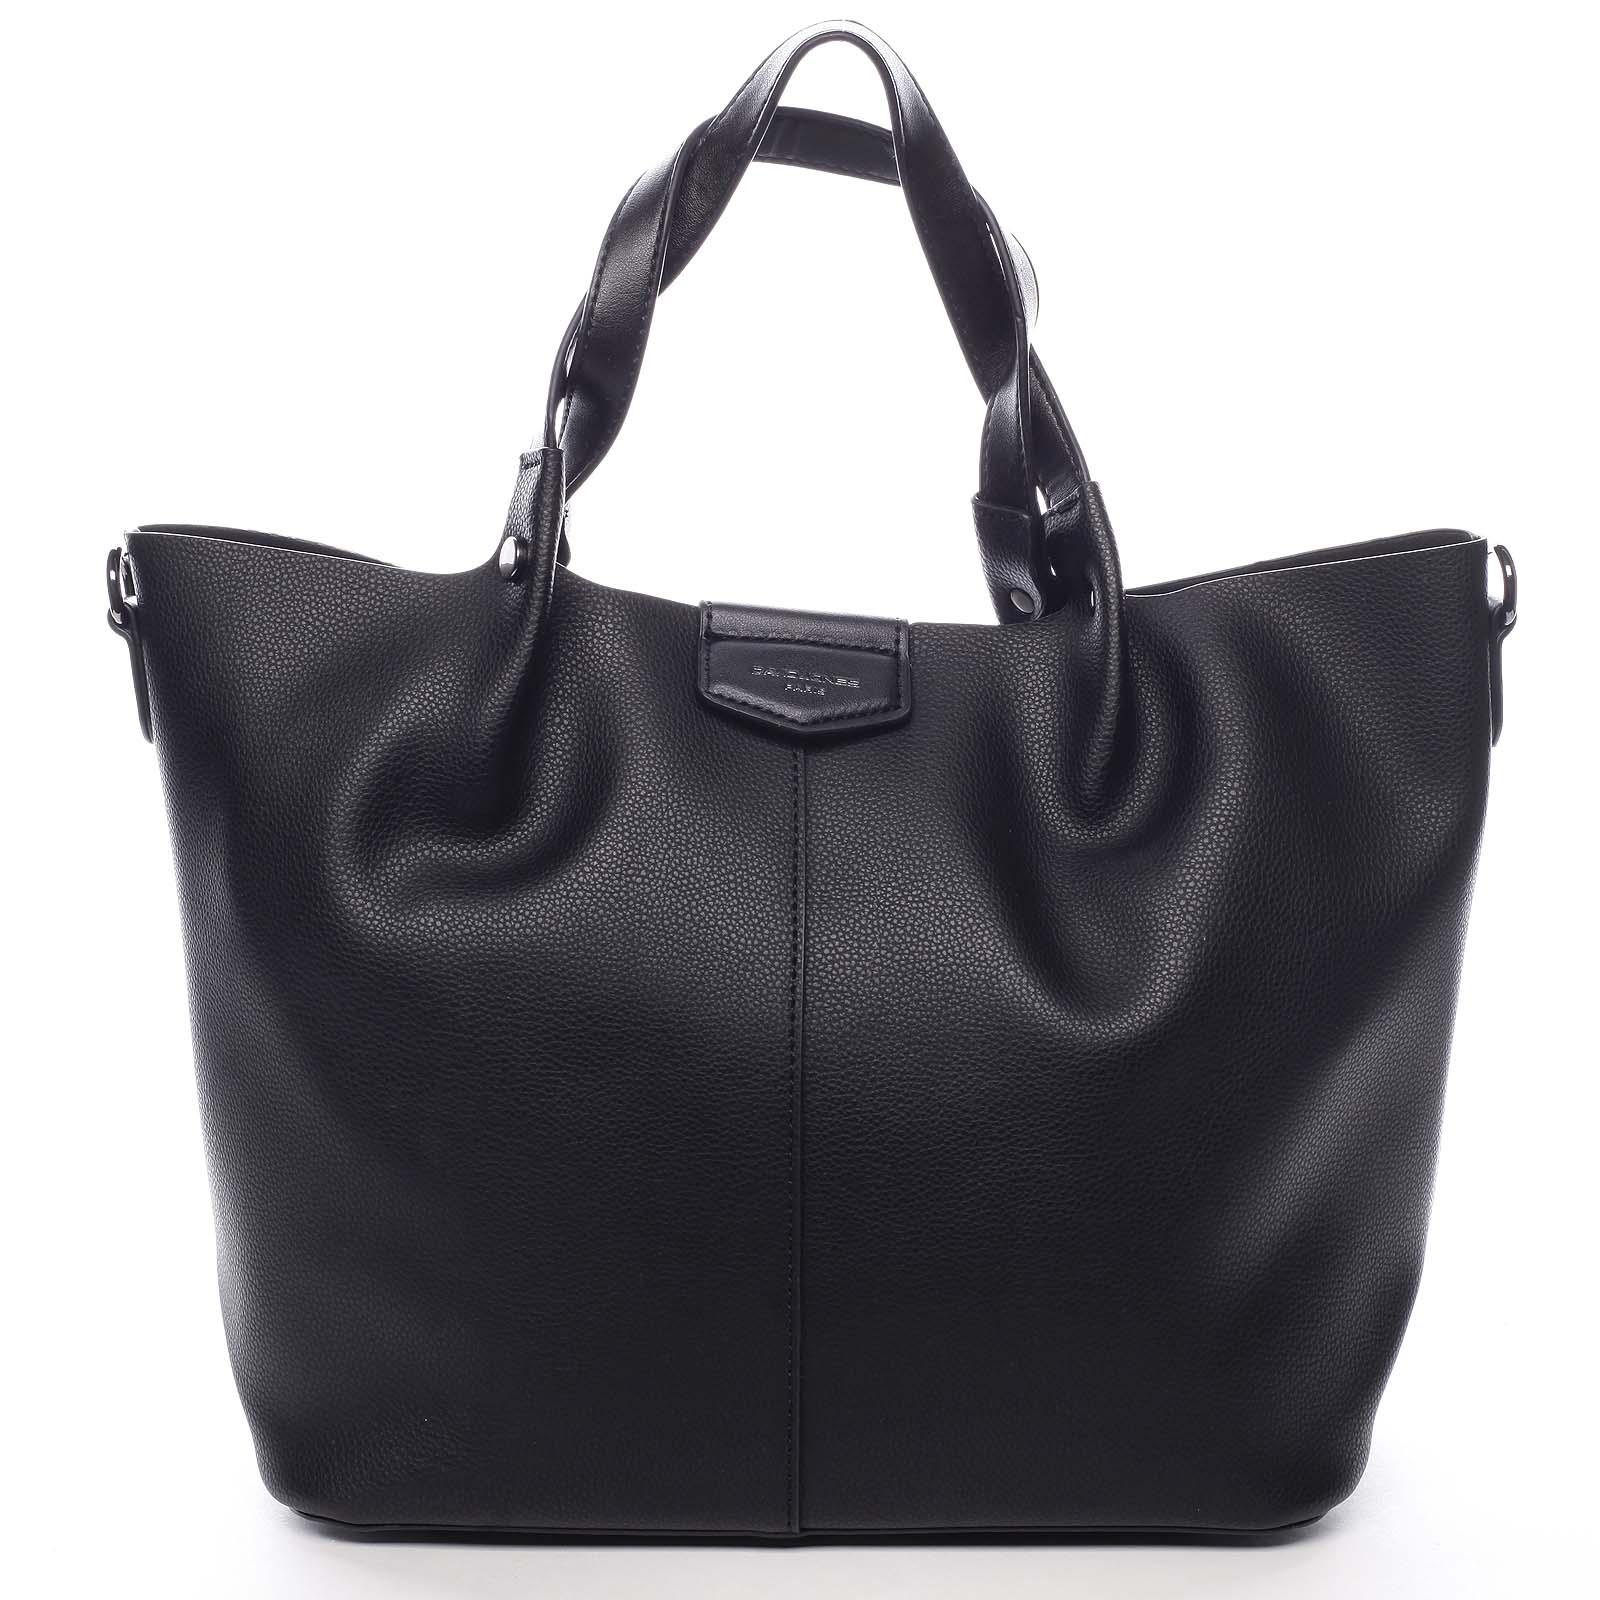 Dámska kabelka čierna - David Jones MyWay čierna